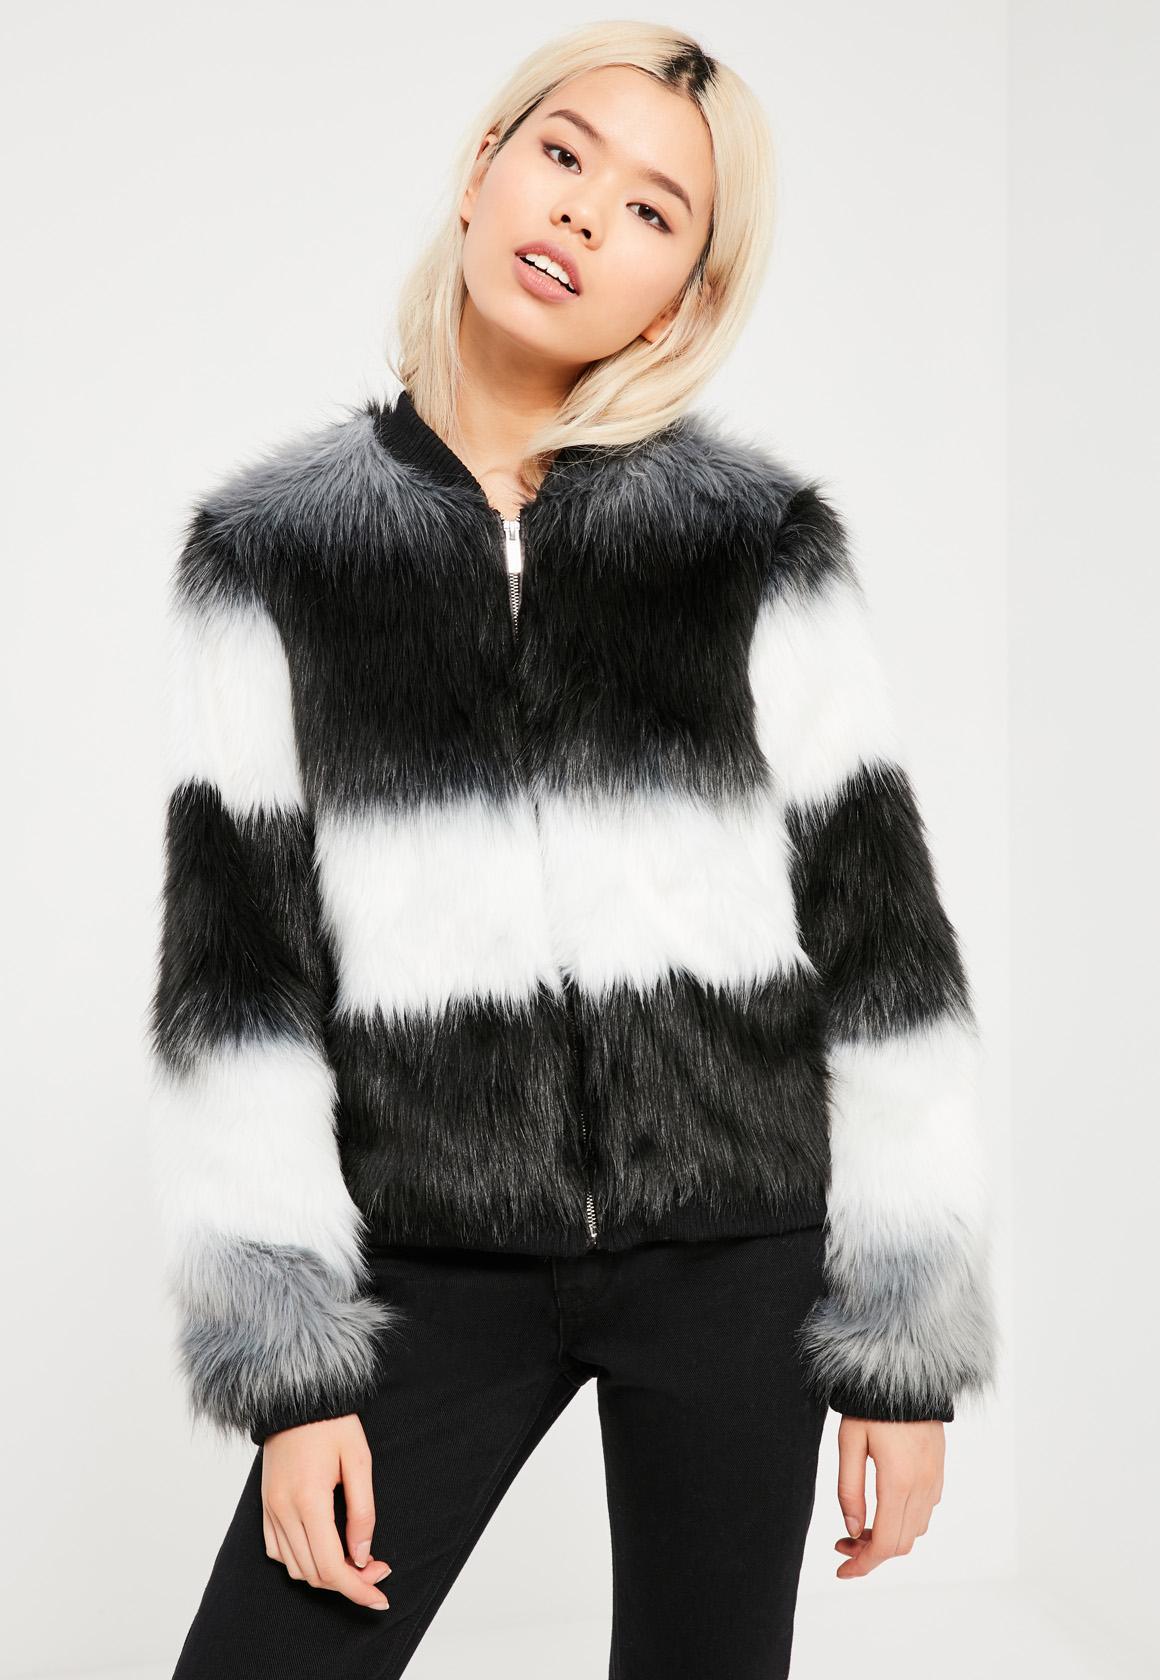 Black Striped Faux Fur Jacket Missguided